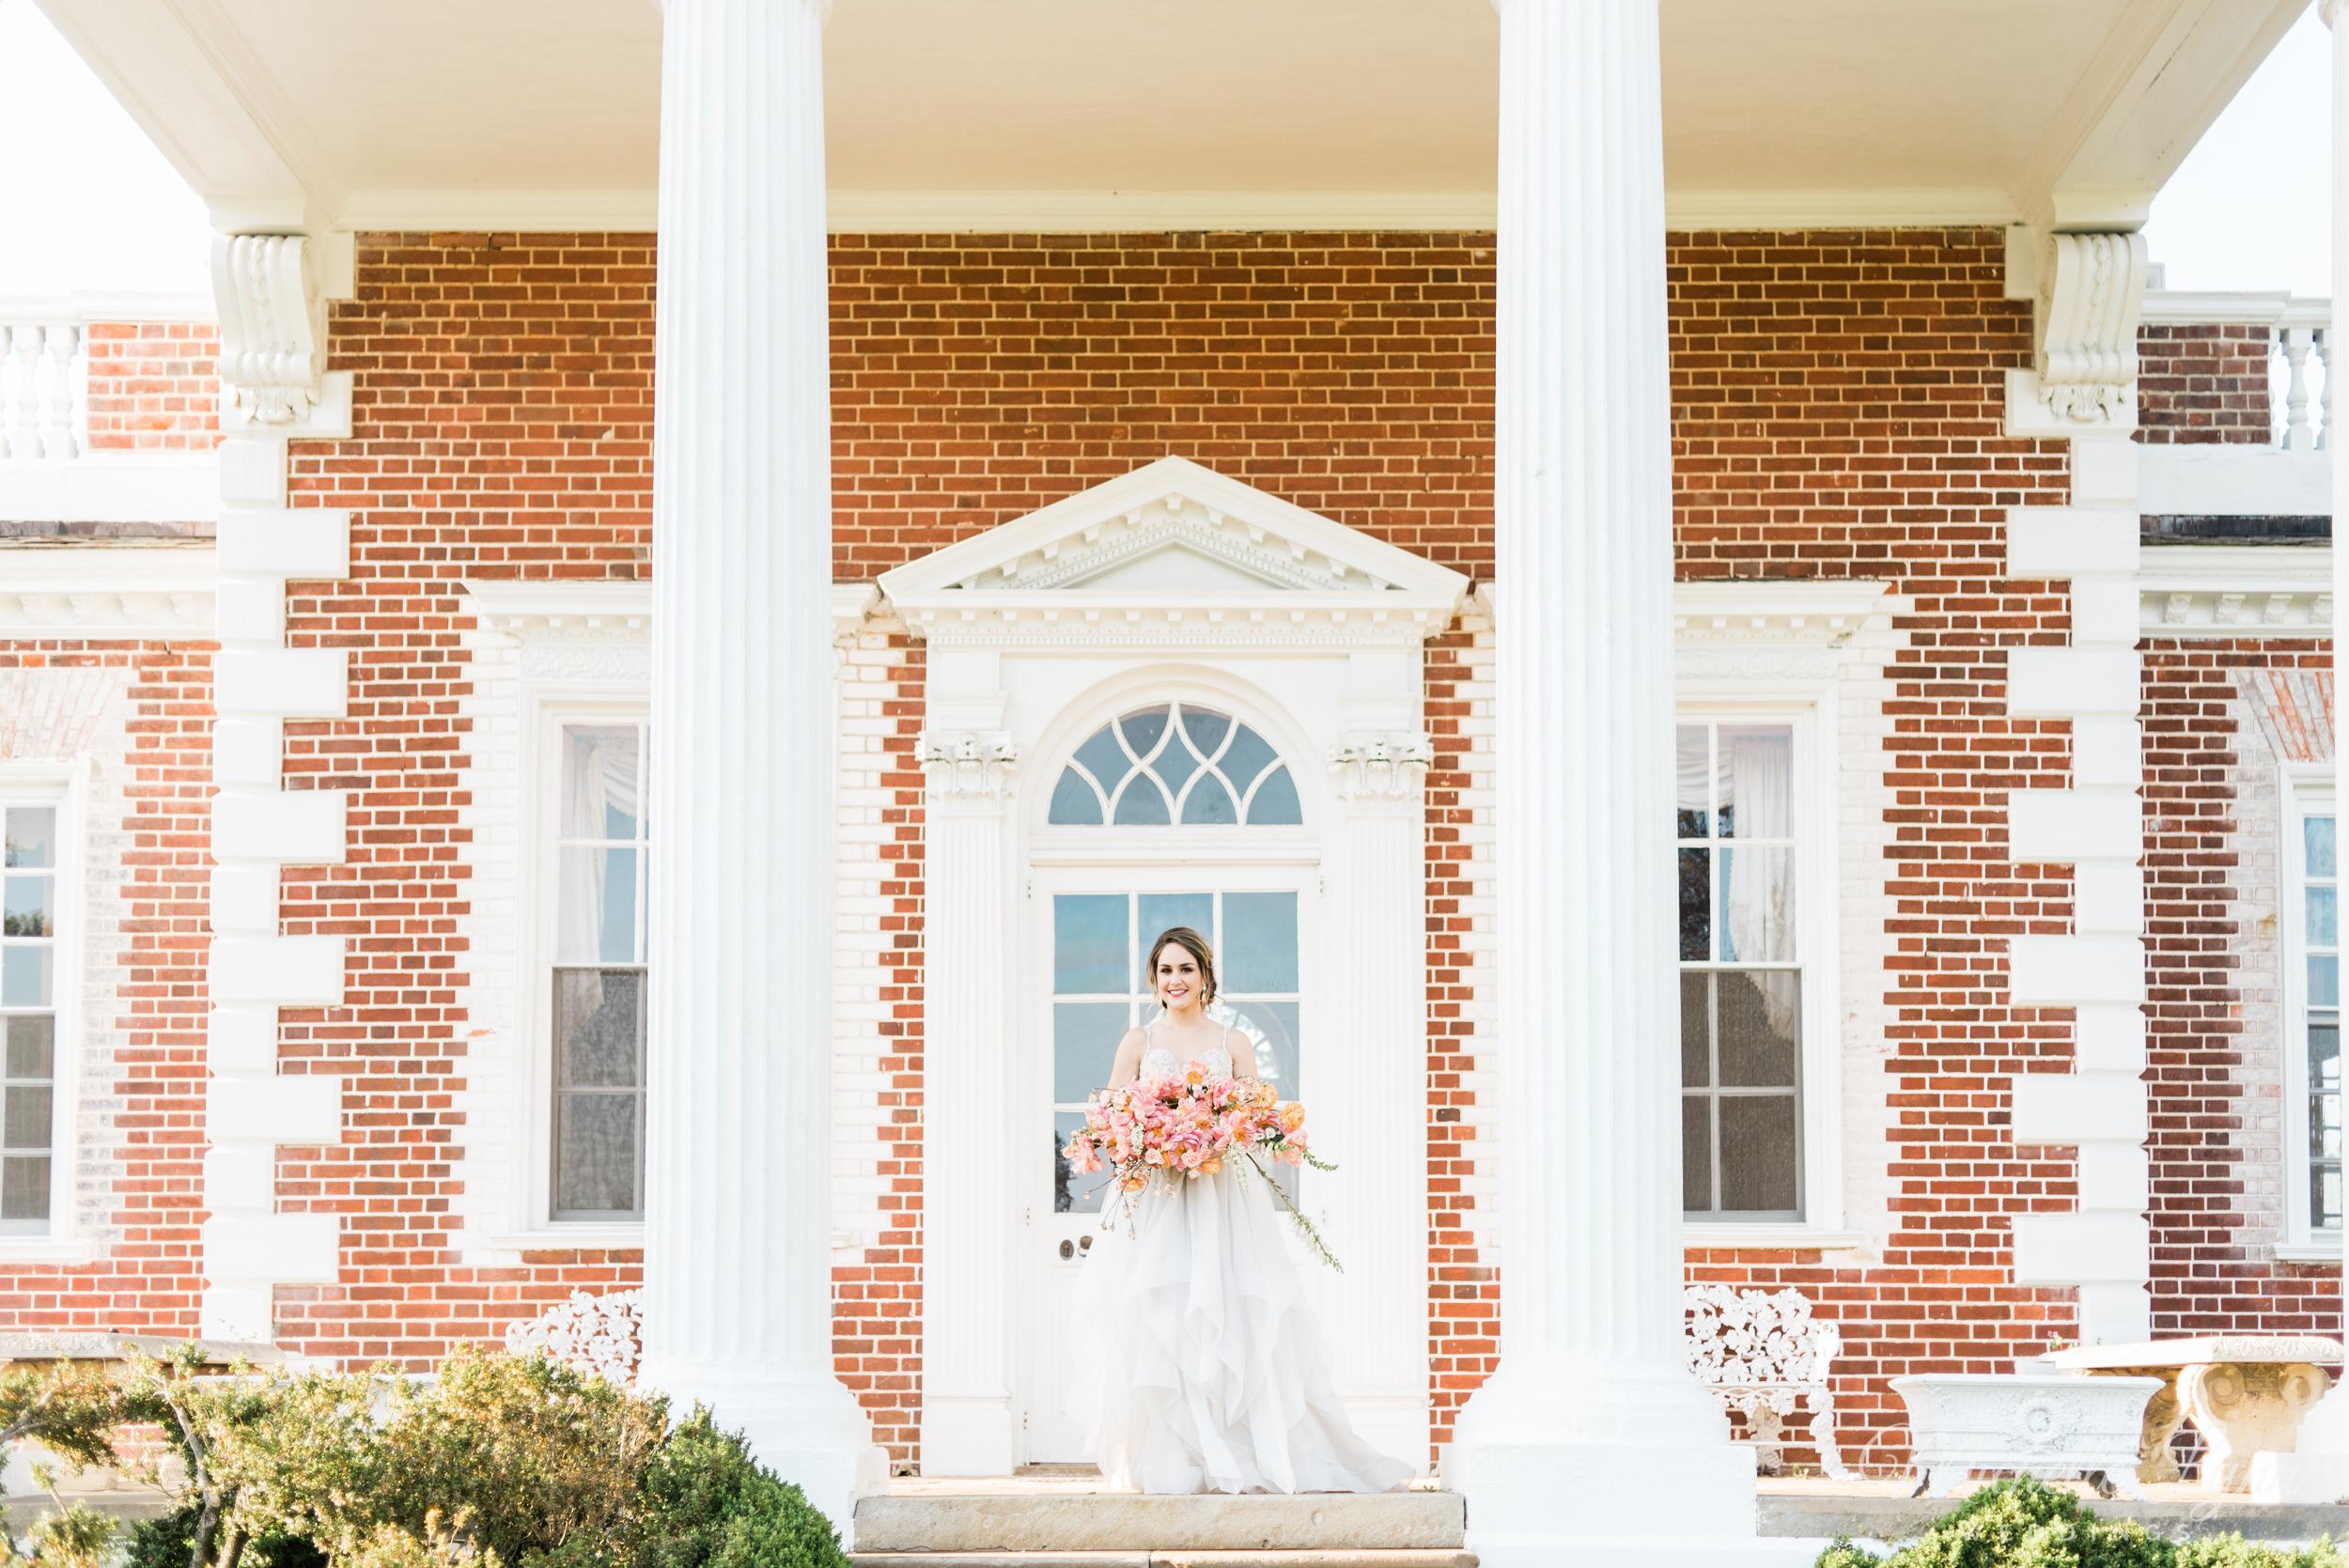 mlw-whitehall-annapolis-maryland-wedding-12.jpg